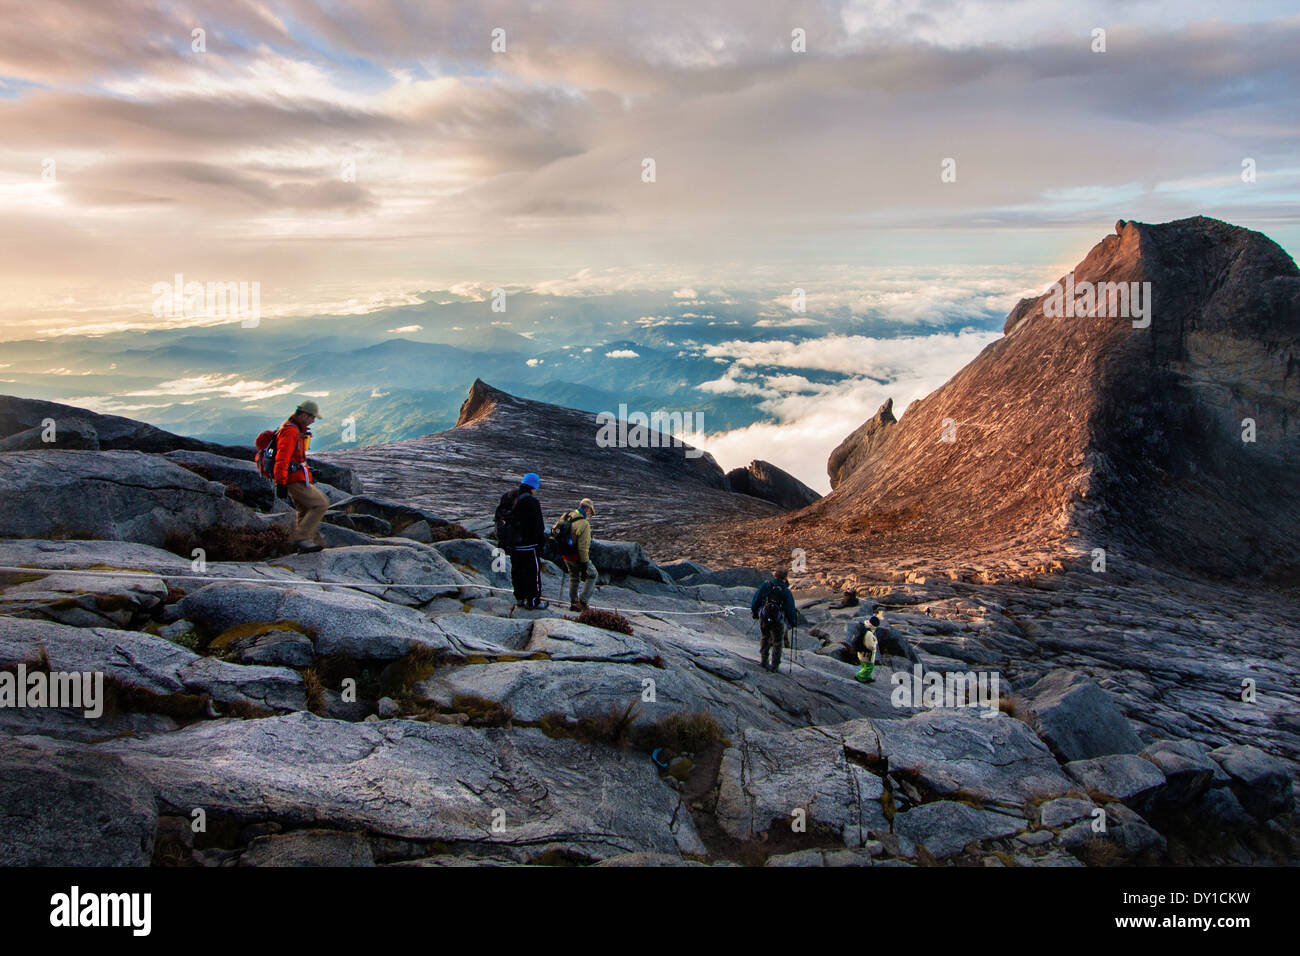 Tourists hike down Mount Kinabalu on February 16, 2012 in Kota Kinabalu,Malaysia. - Stock Image